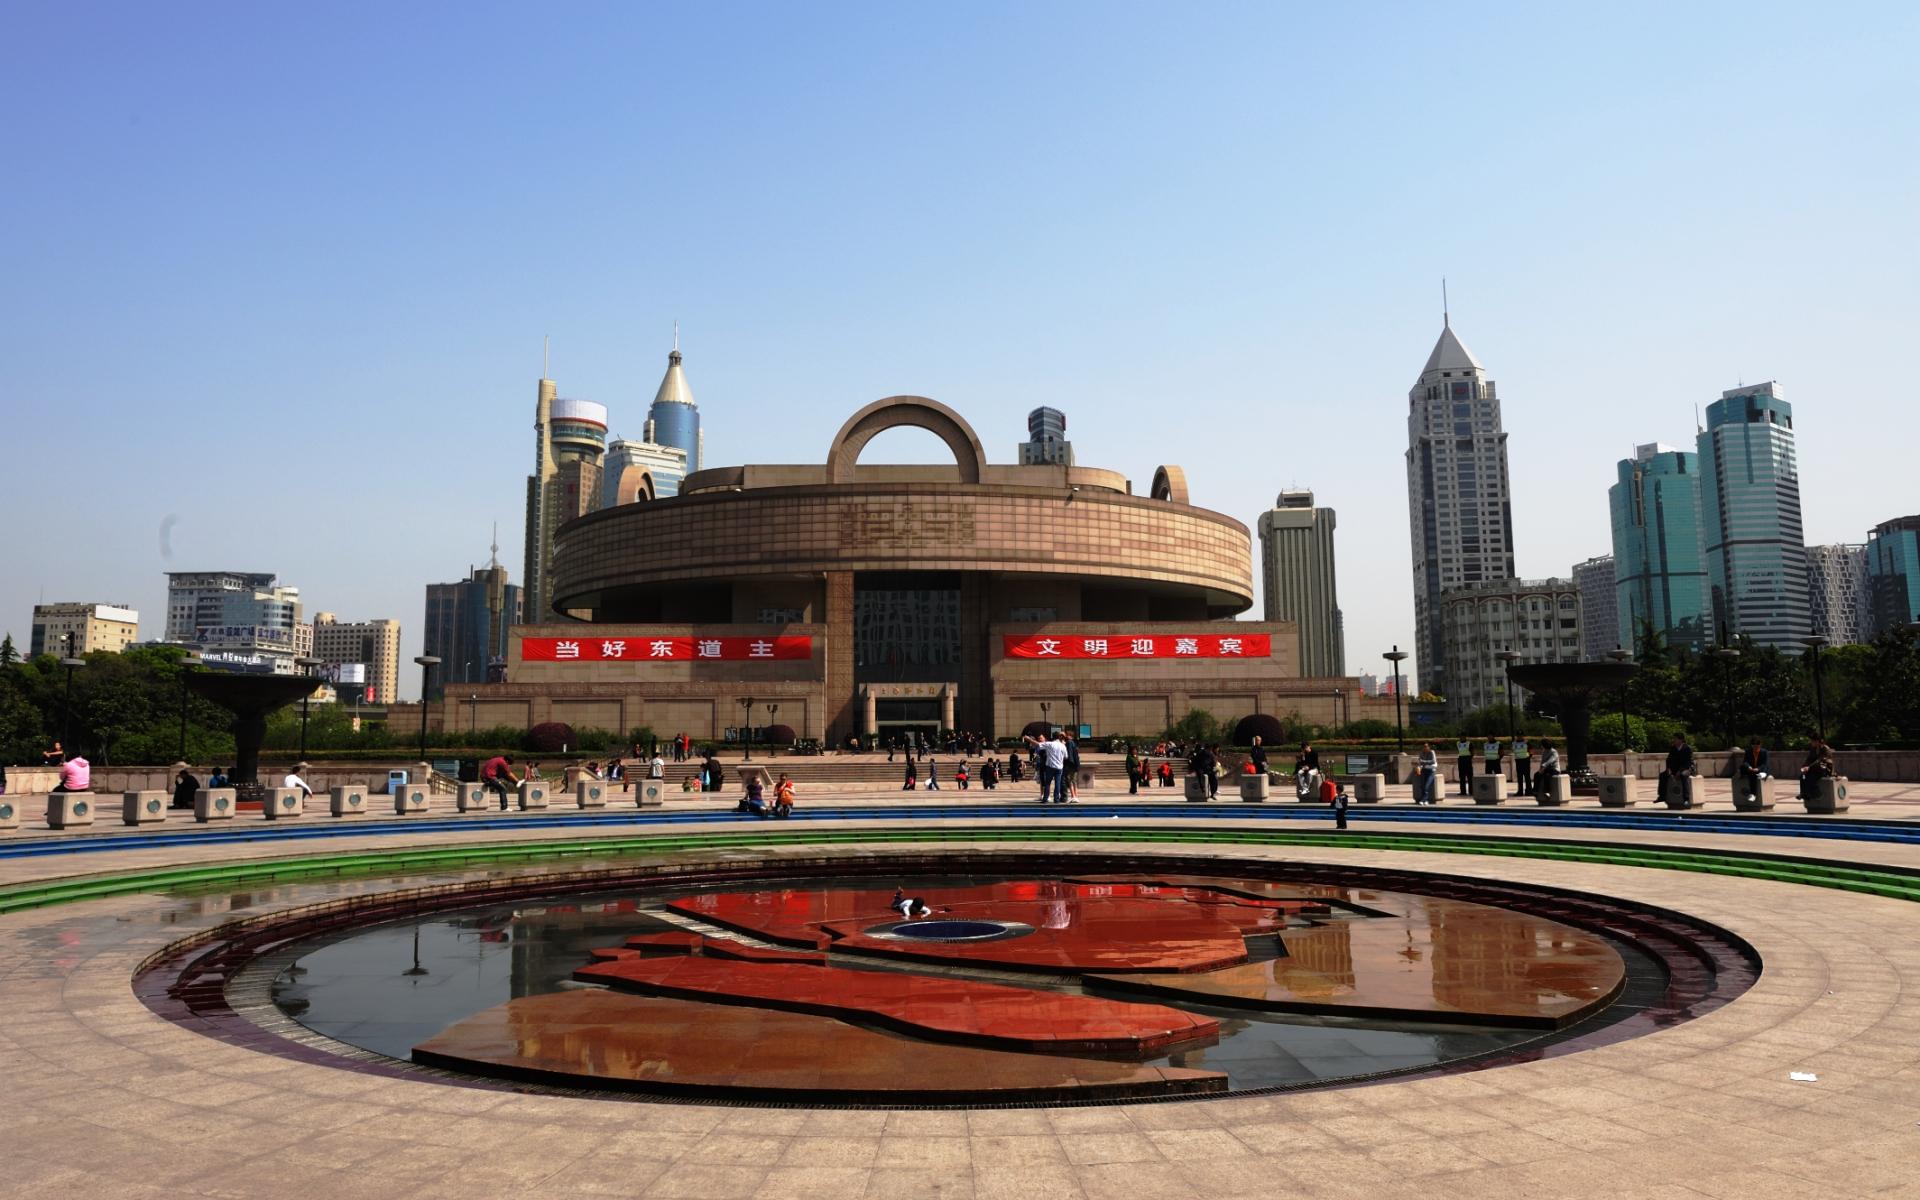 Картинка Музей древнего Китая в ...: www.kartinki24.ru/kartinki/muzei/20359.html